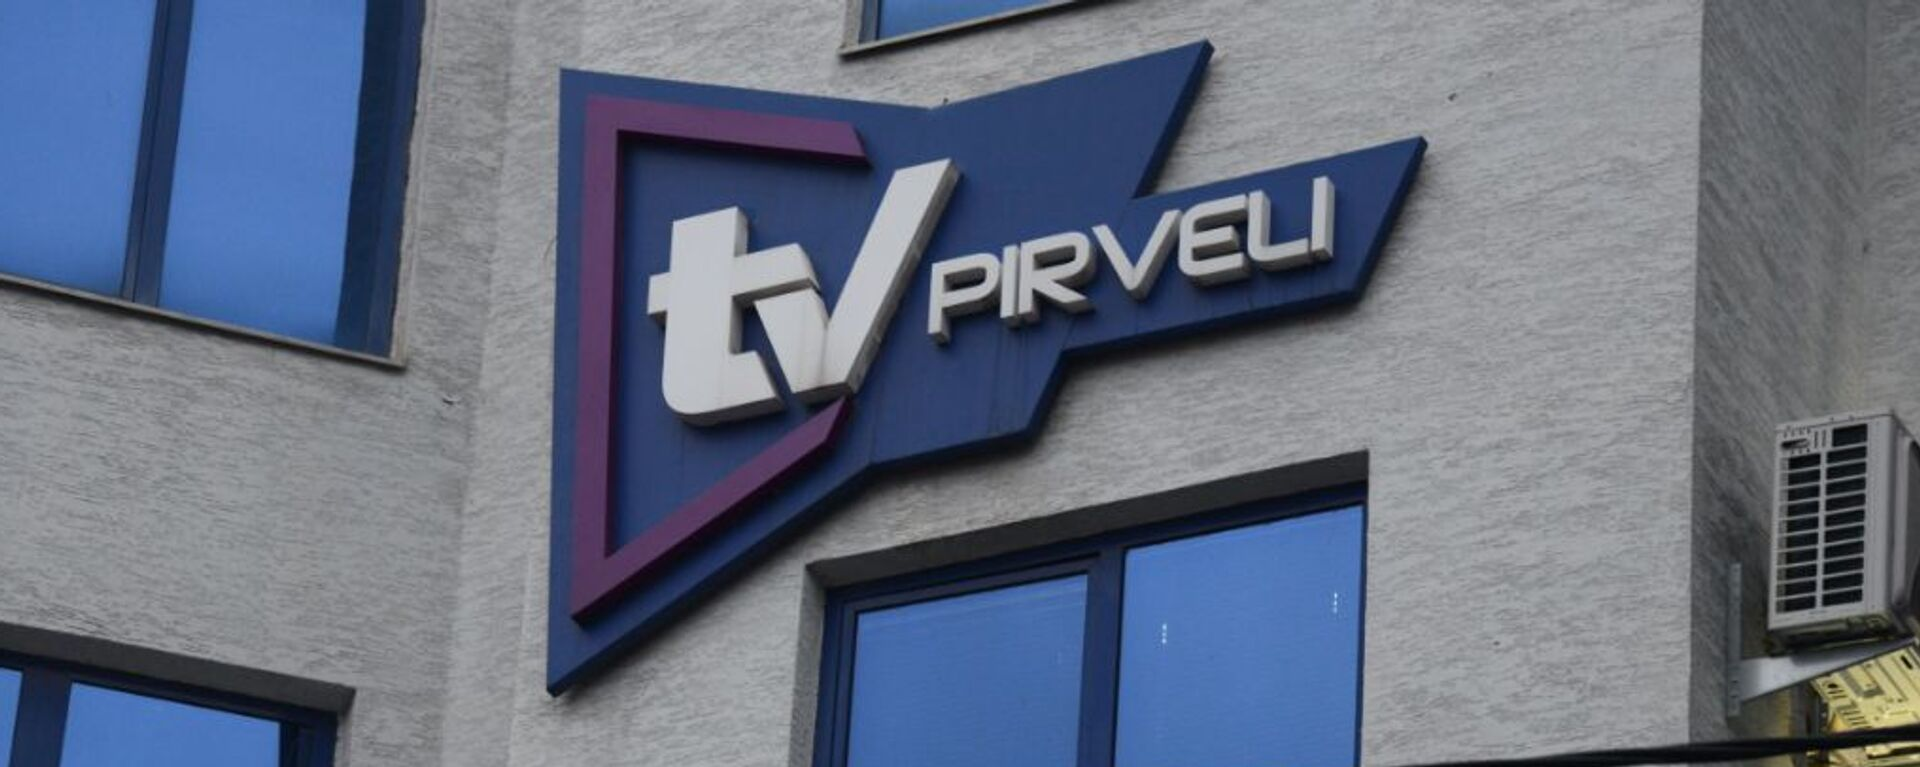 TV Pirveli-ს შენობა - Sputnik საქართველო, 1920, 11.03.2021